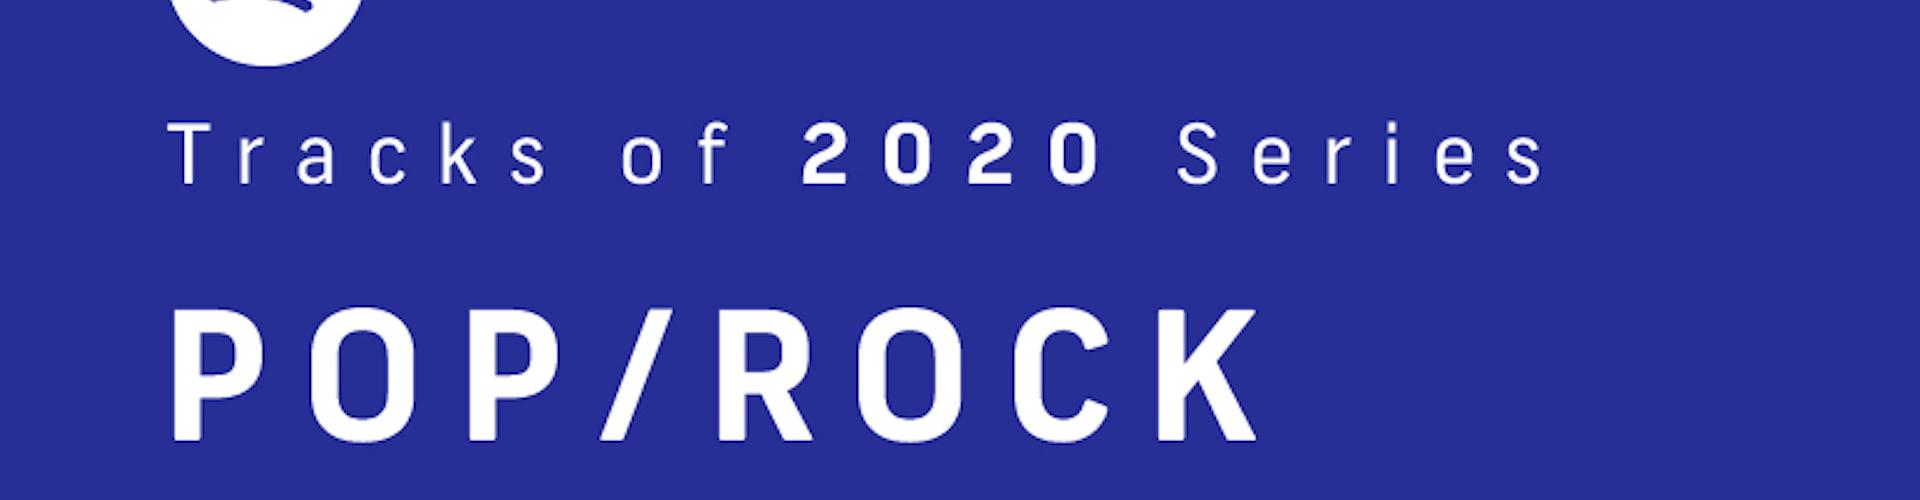 Pop-Rock-Artboard-8-100-Copy-copy